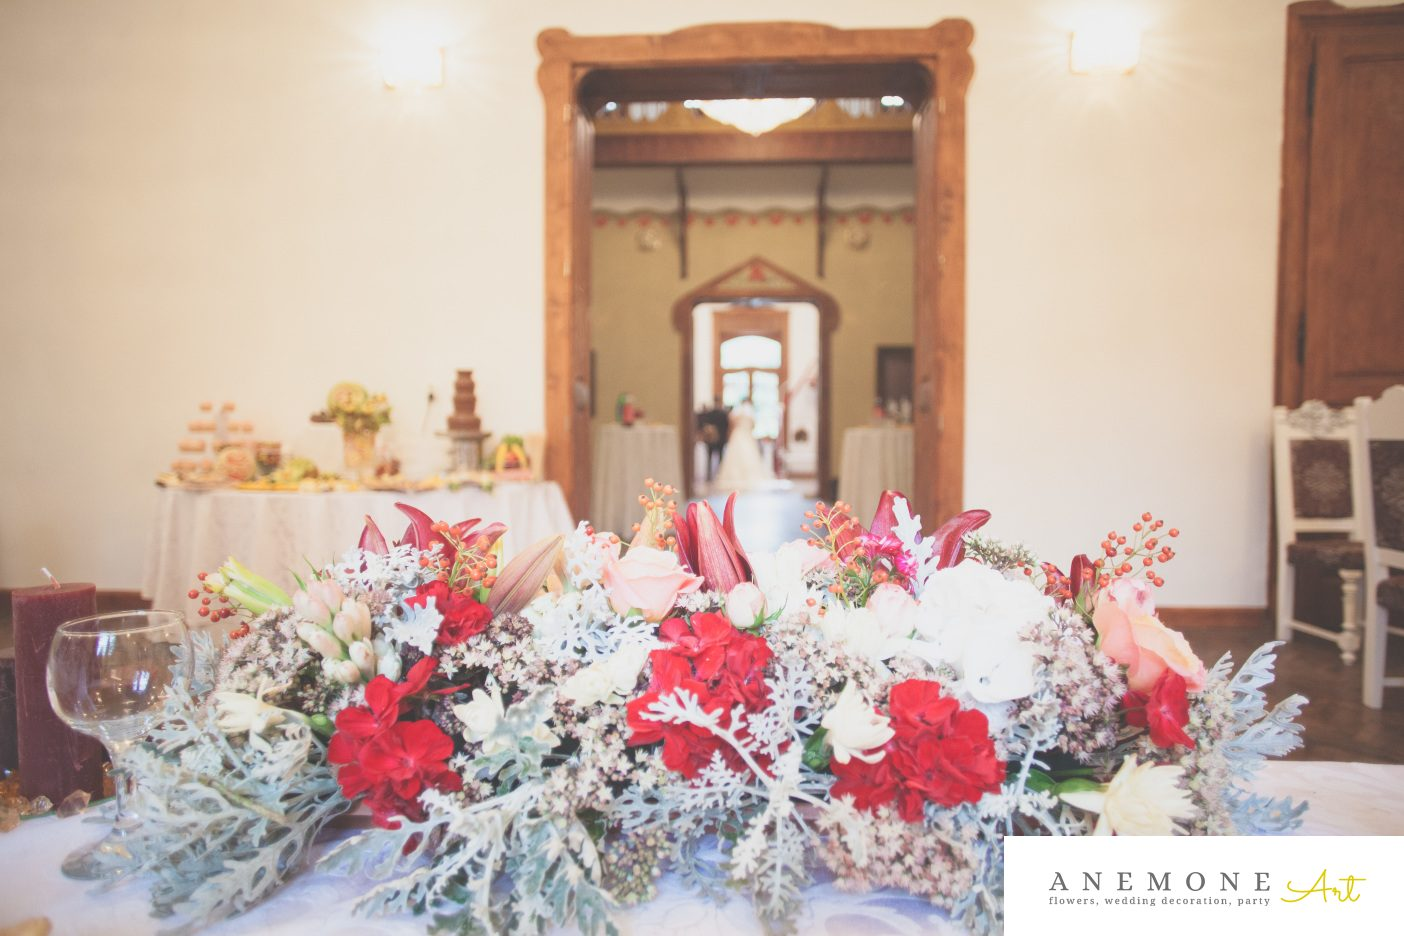 Poza, foto cu Flori de nunta bordo, prezidiu, rosu in Arad, Timisoara, Oradea (wedding flowers, bouquets) nunta Arad, Timisoara, Oradea